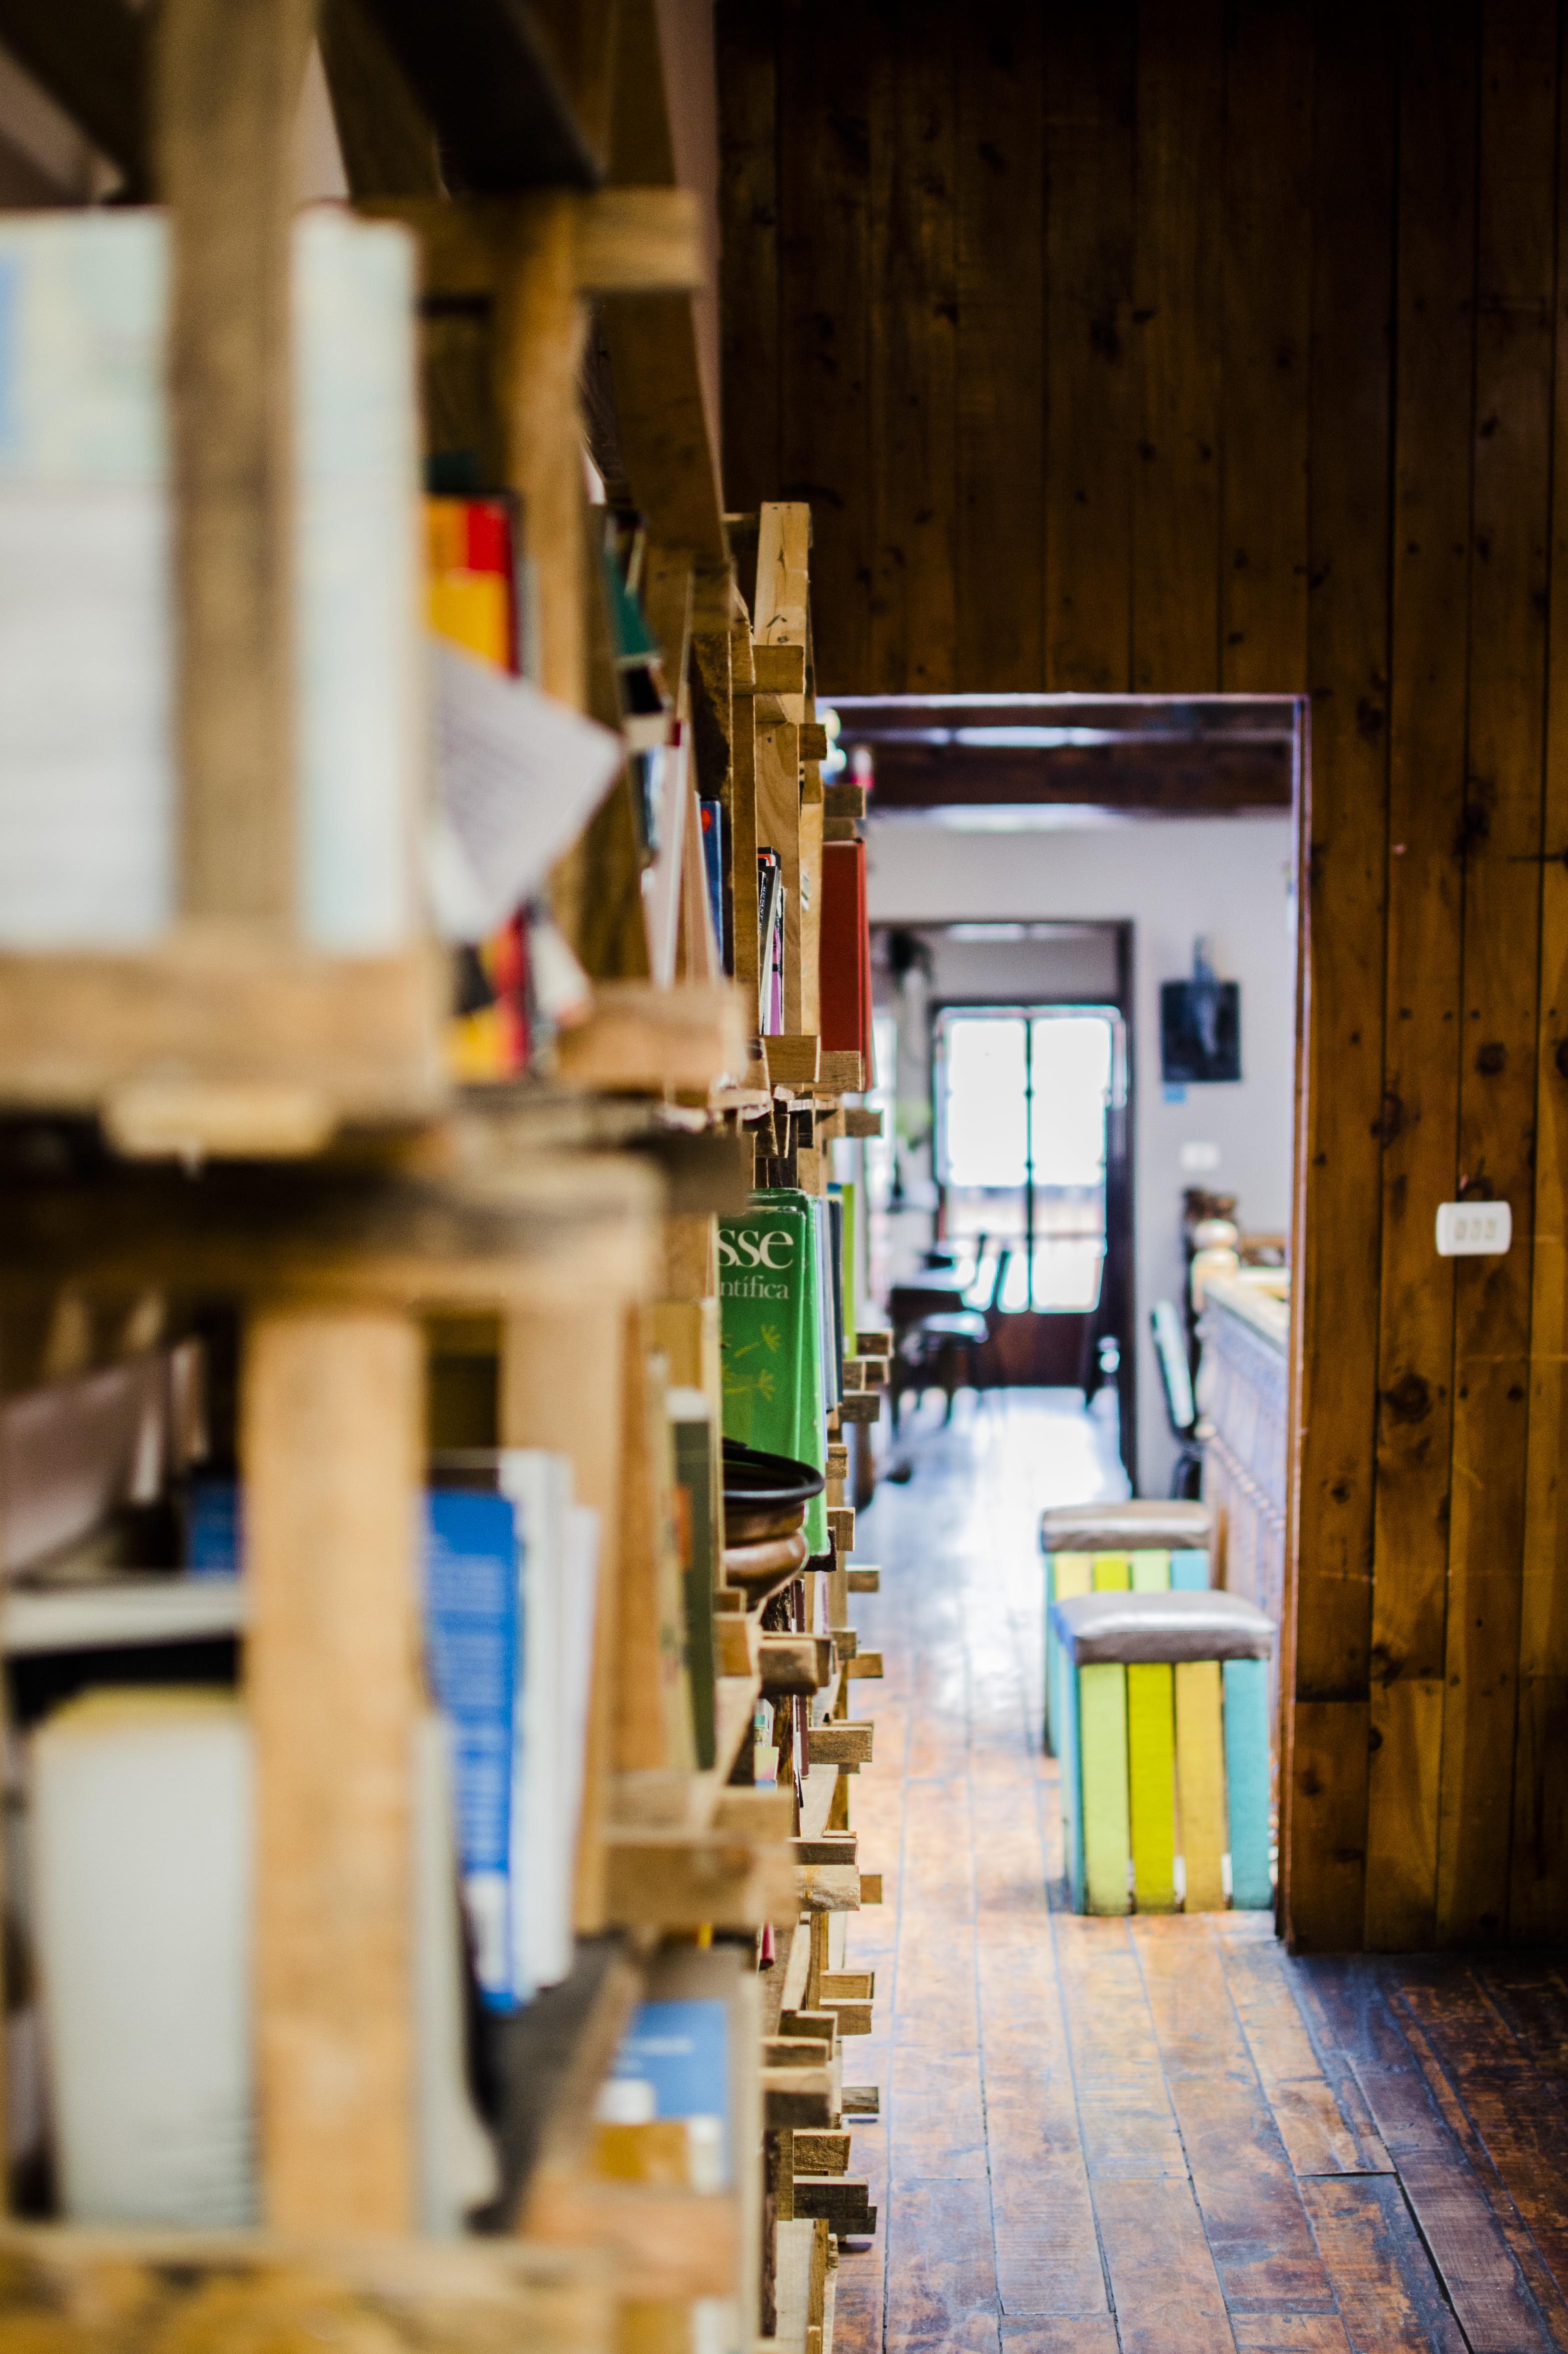 Bookshelf and hallway